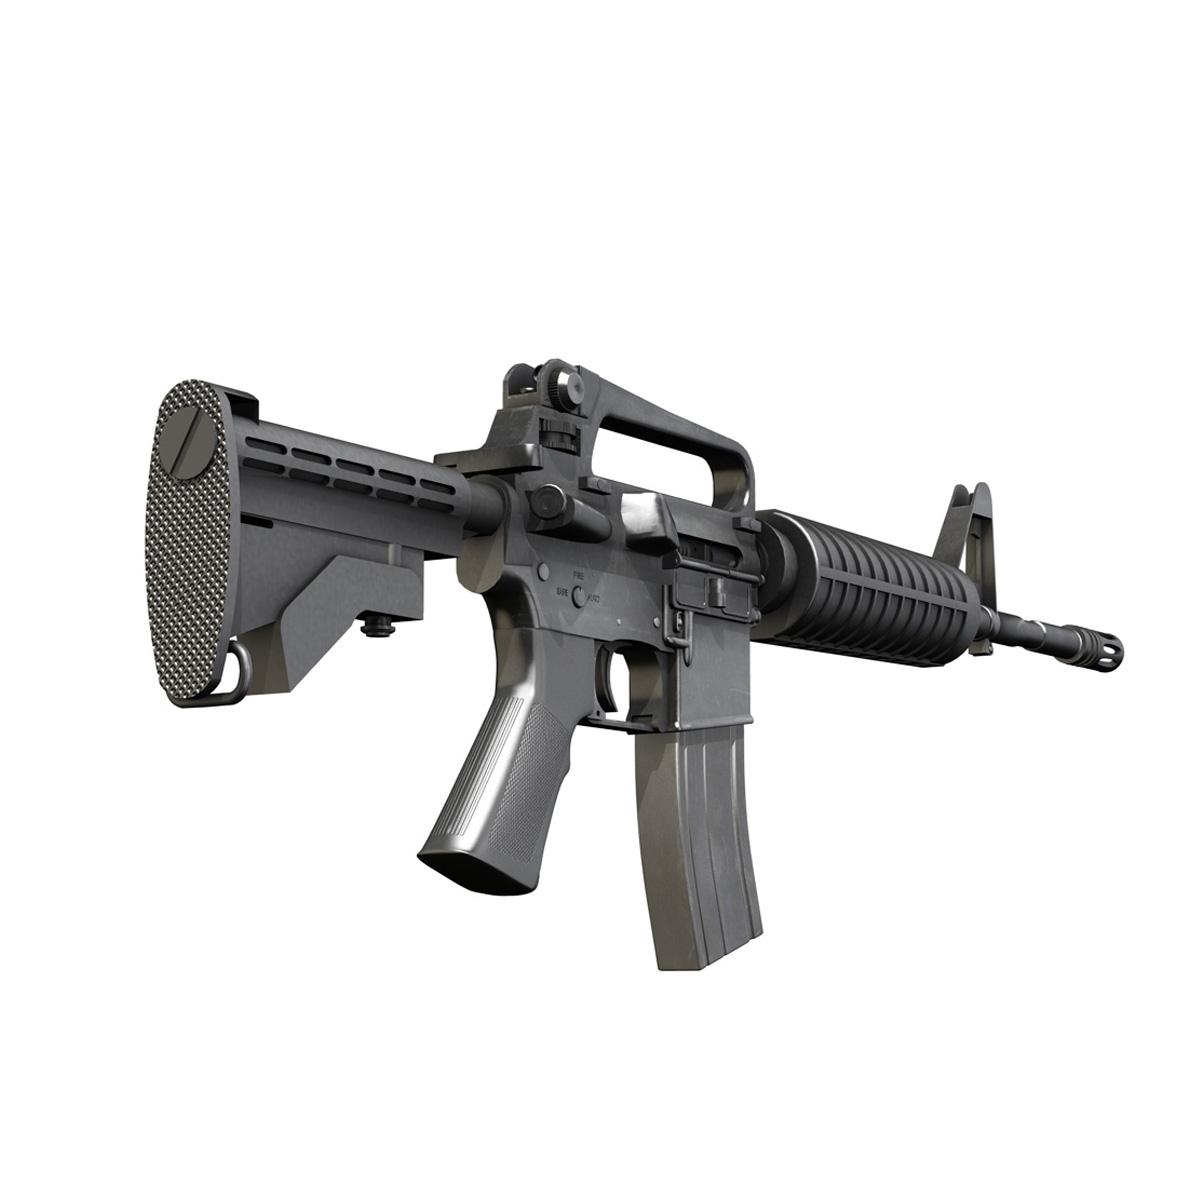 colt m4a1 carbine довтолгооны буу 3d загвар 3ds fbx c4d lwo obj 187789